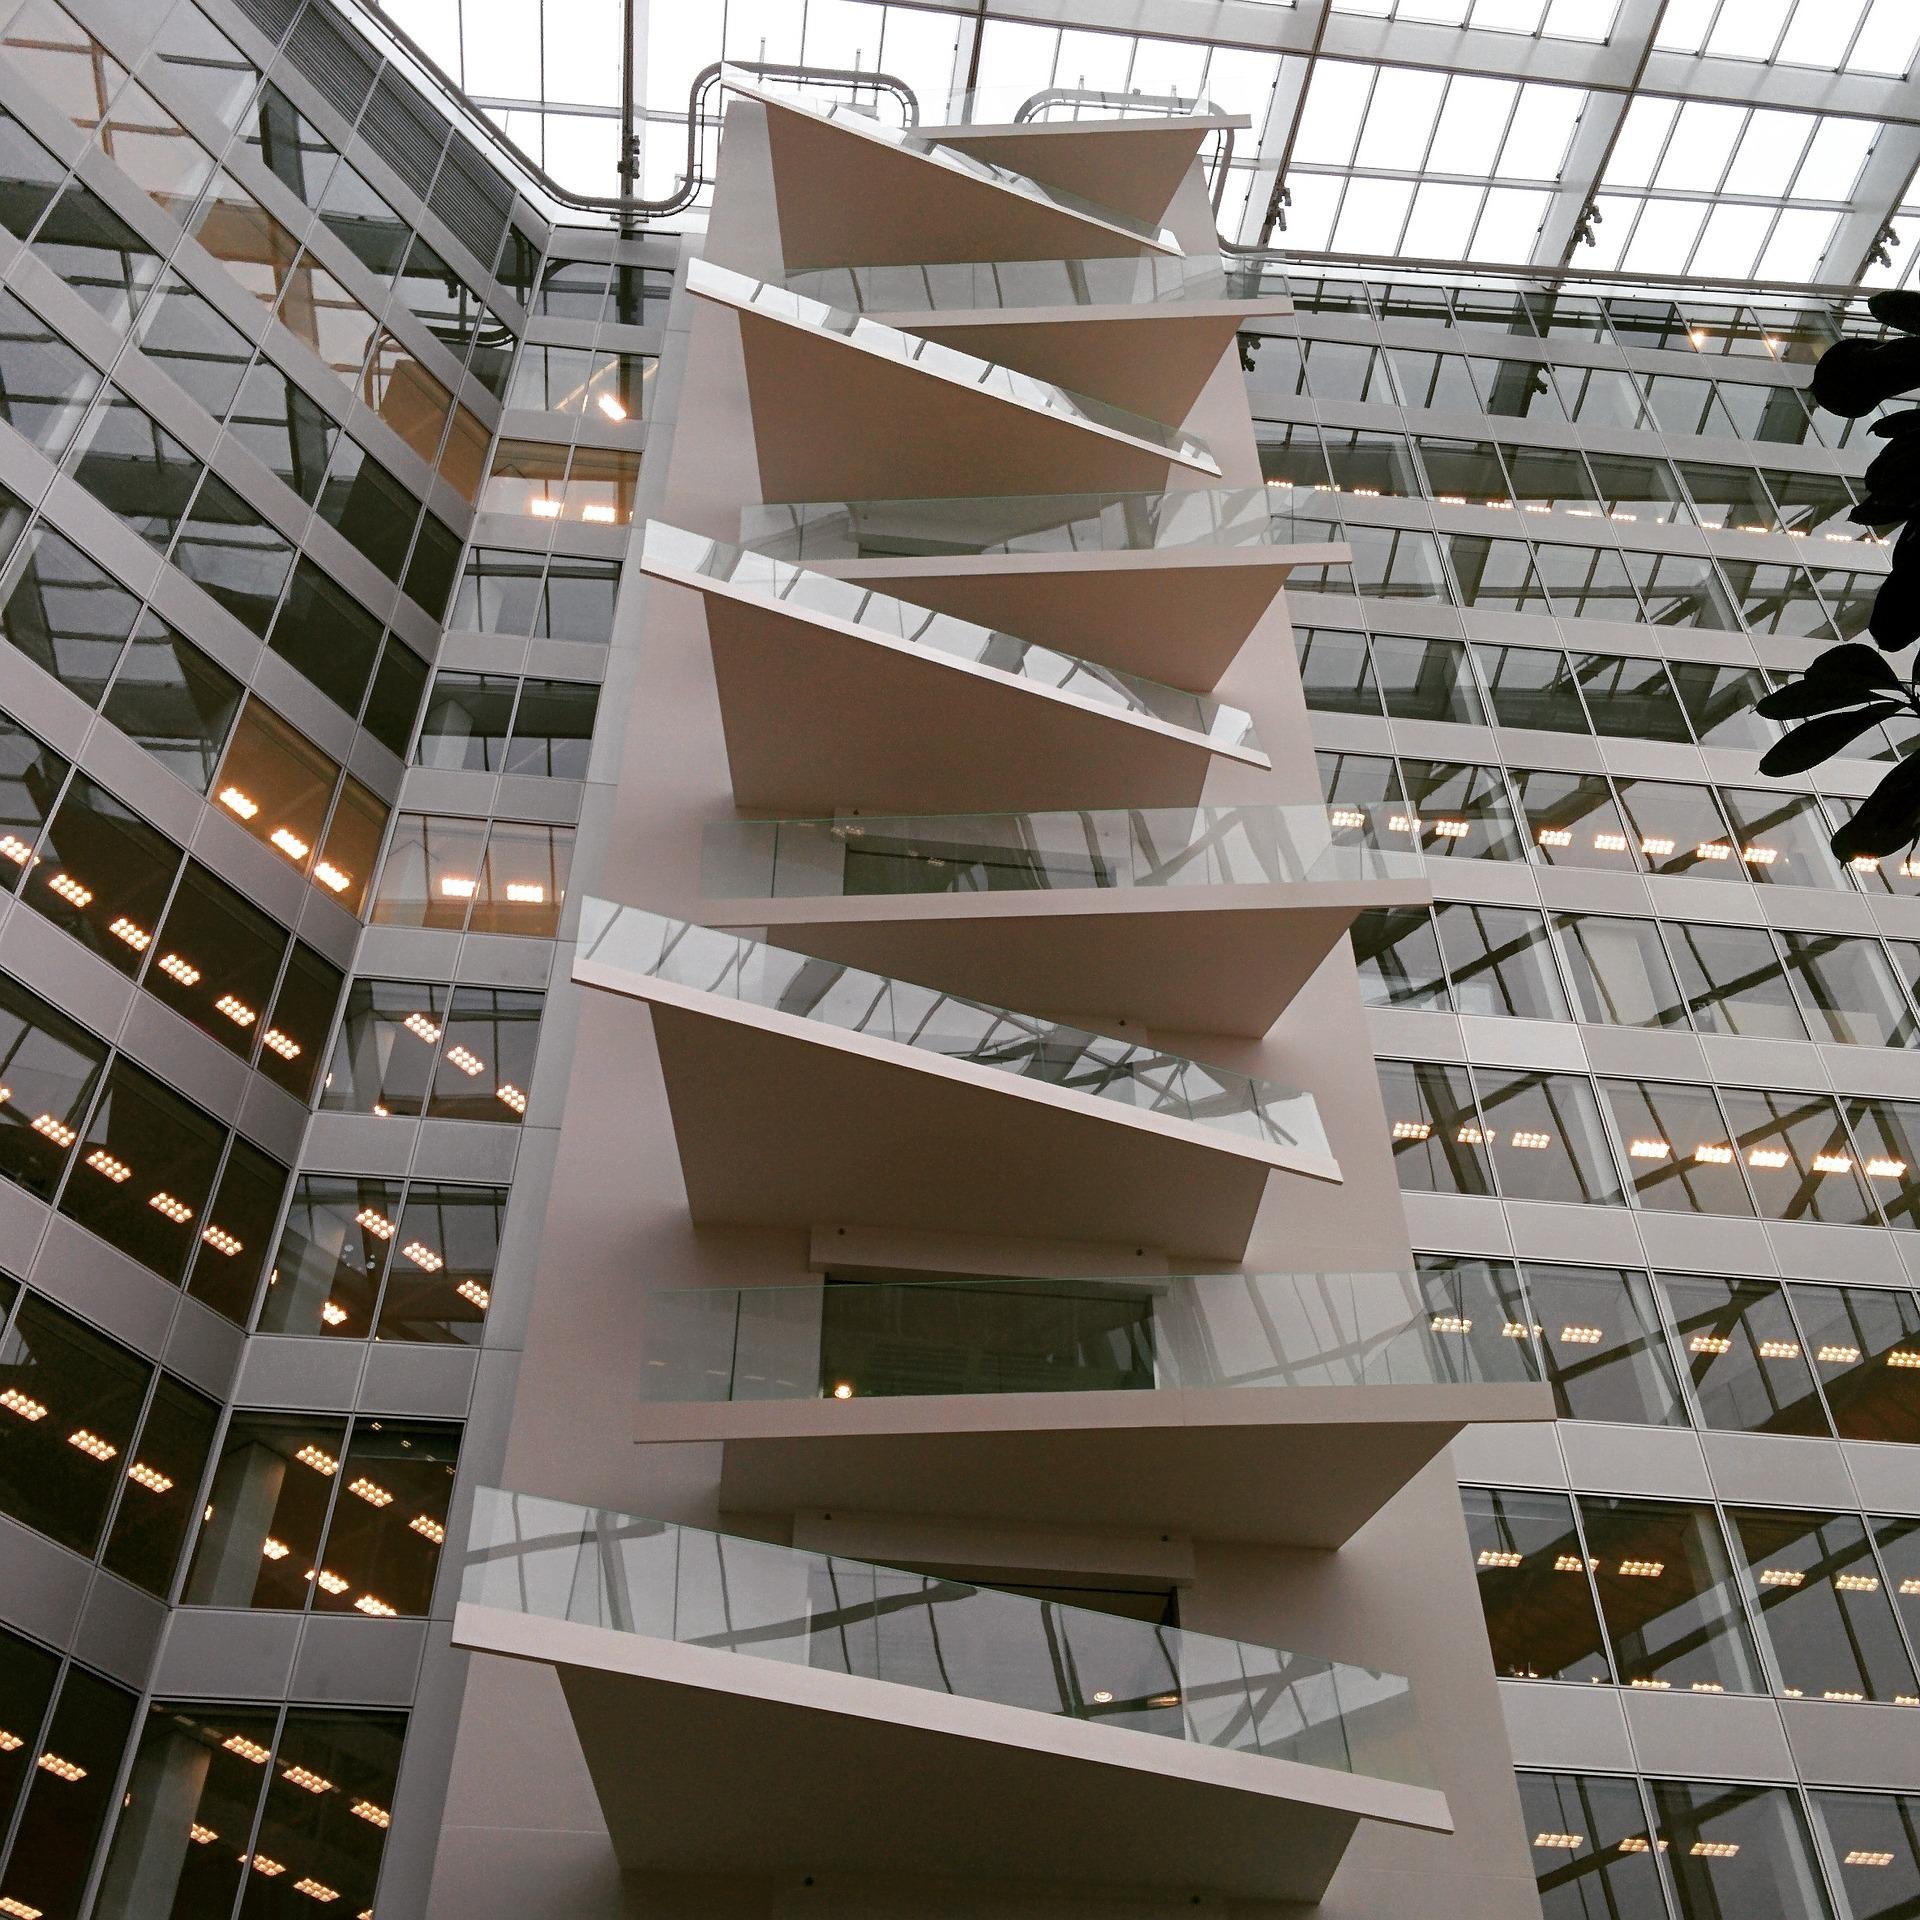 Commercial Architects Revit.jpg